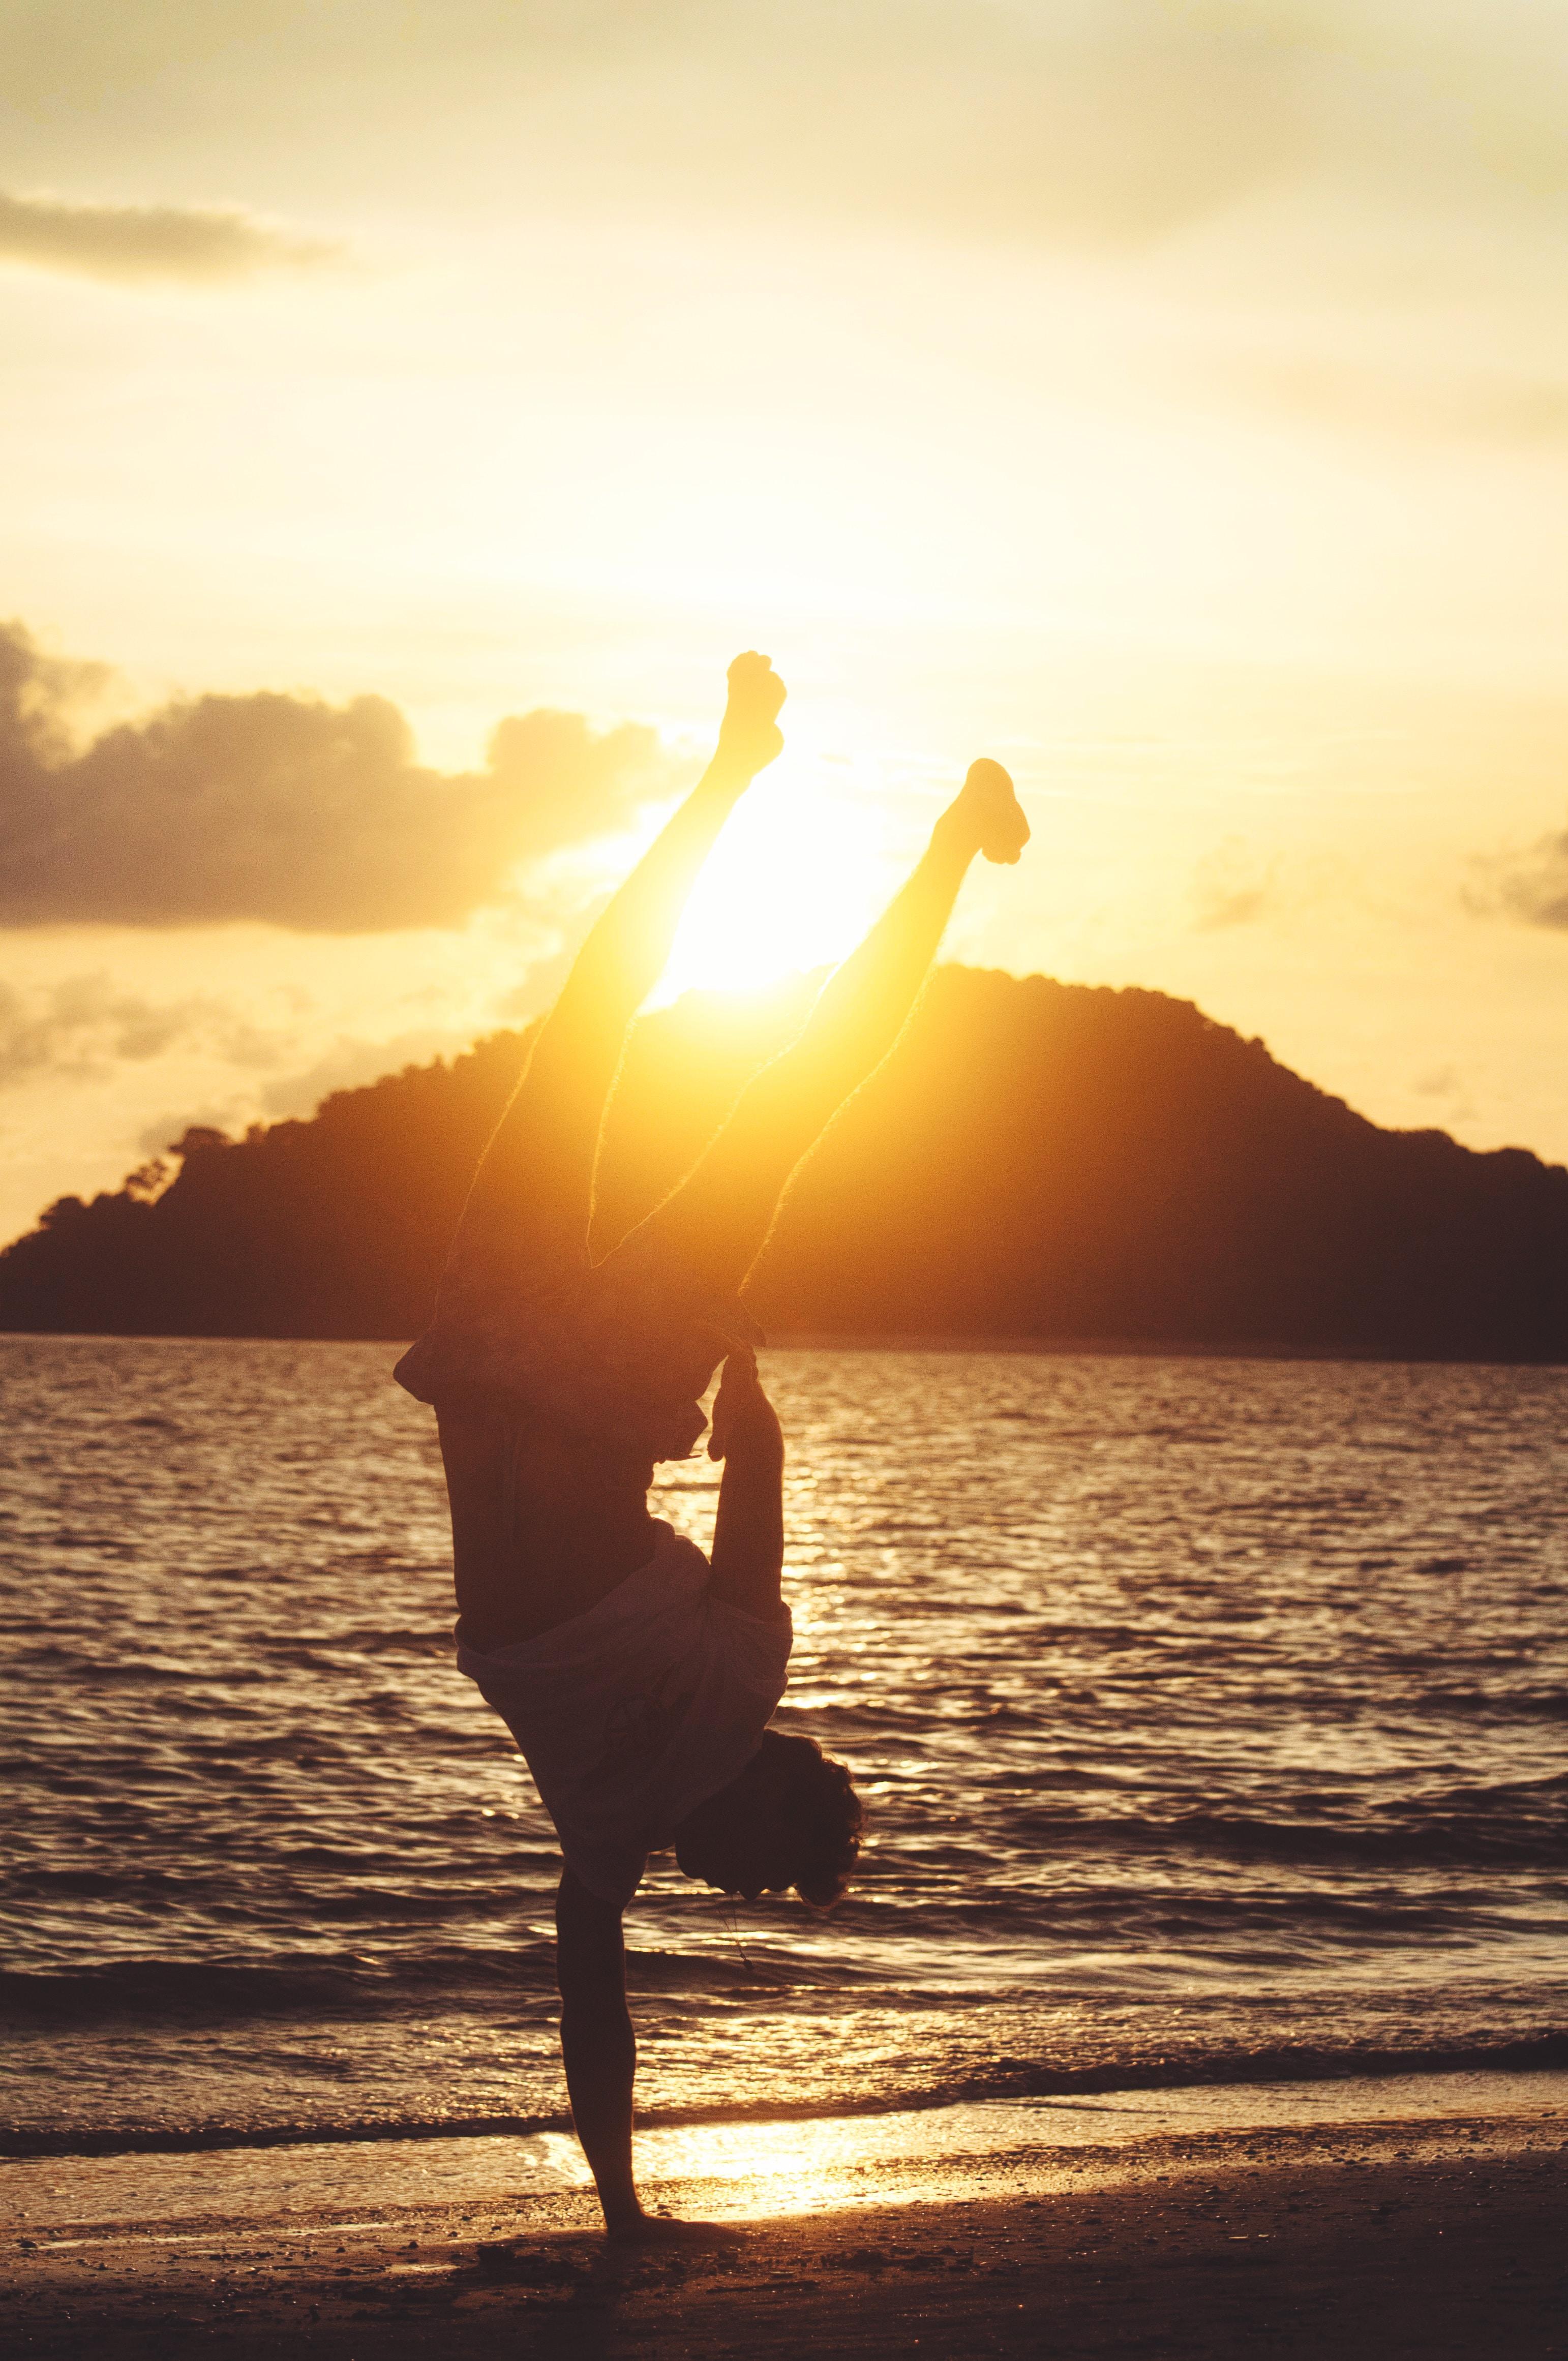 silhouette photo of man hand standing on seashore